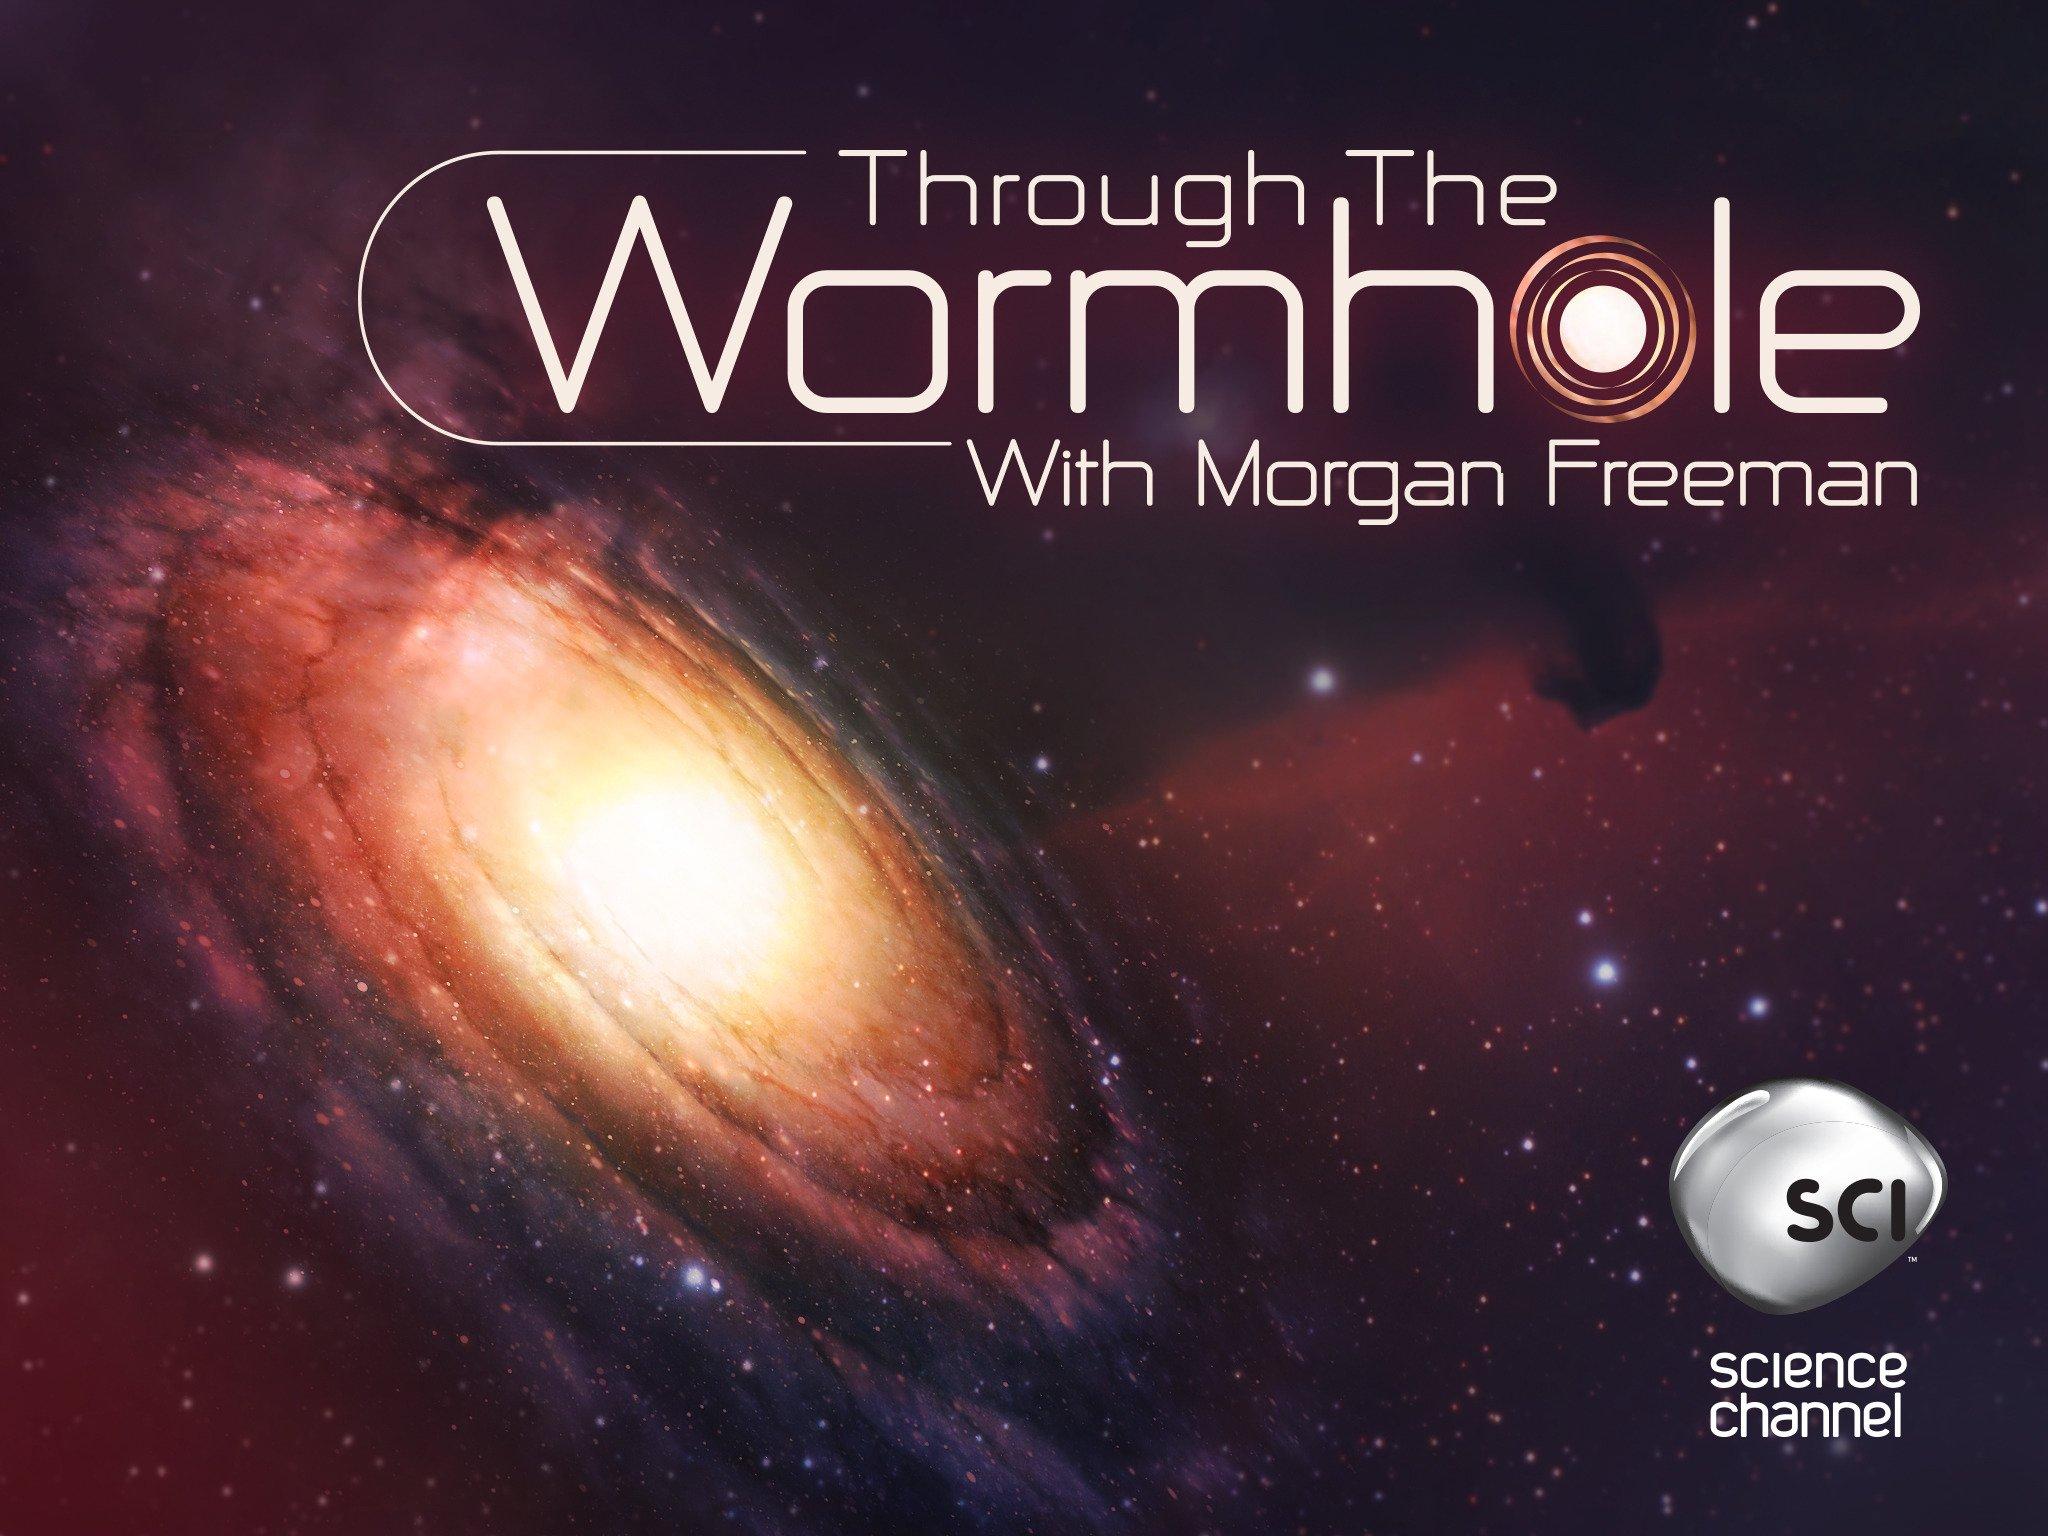 through the wormhole season 6 episode 6